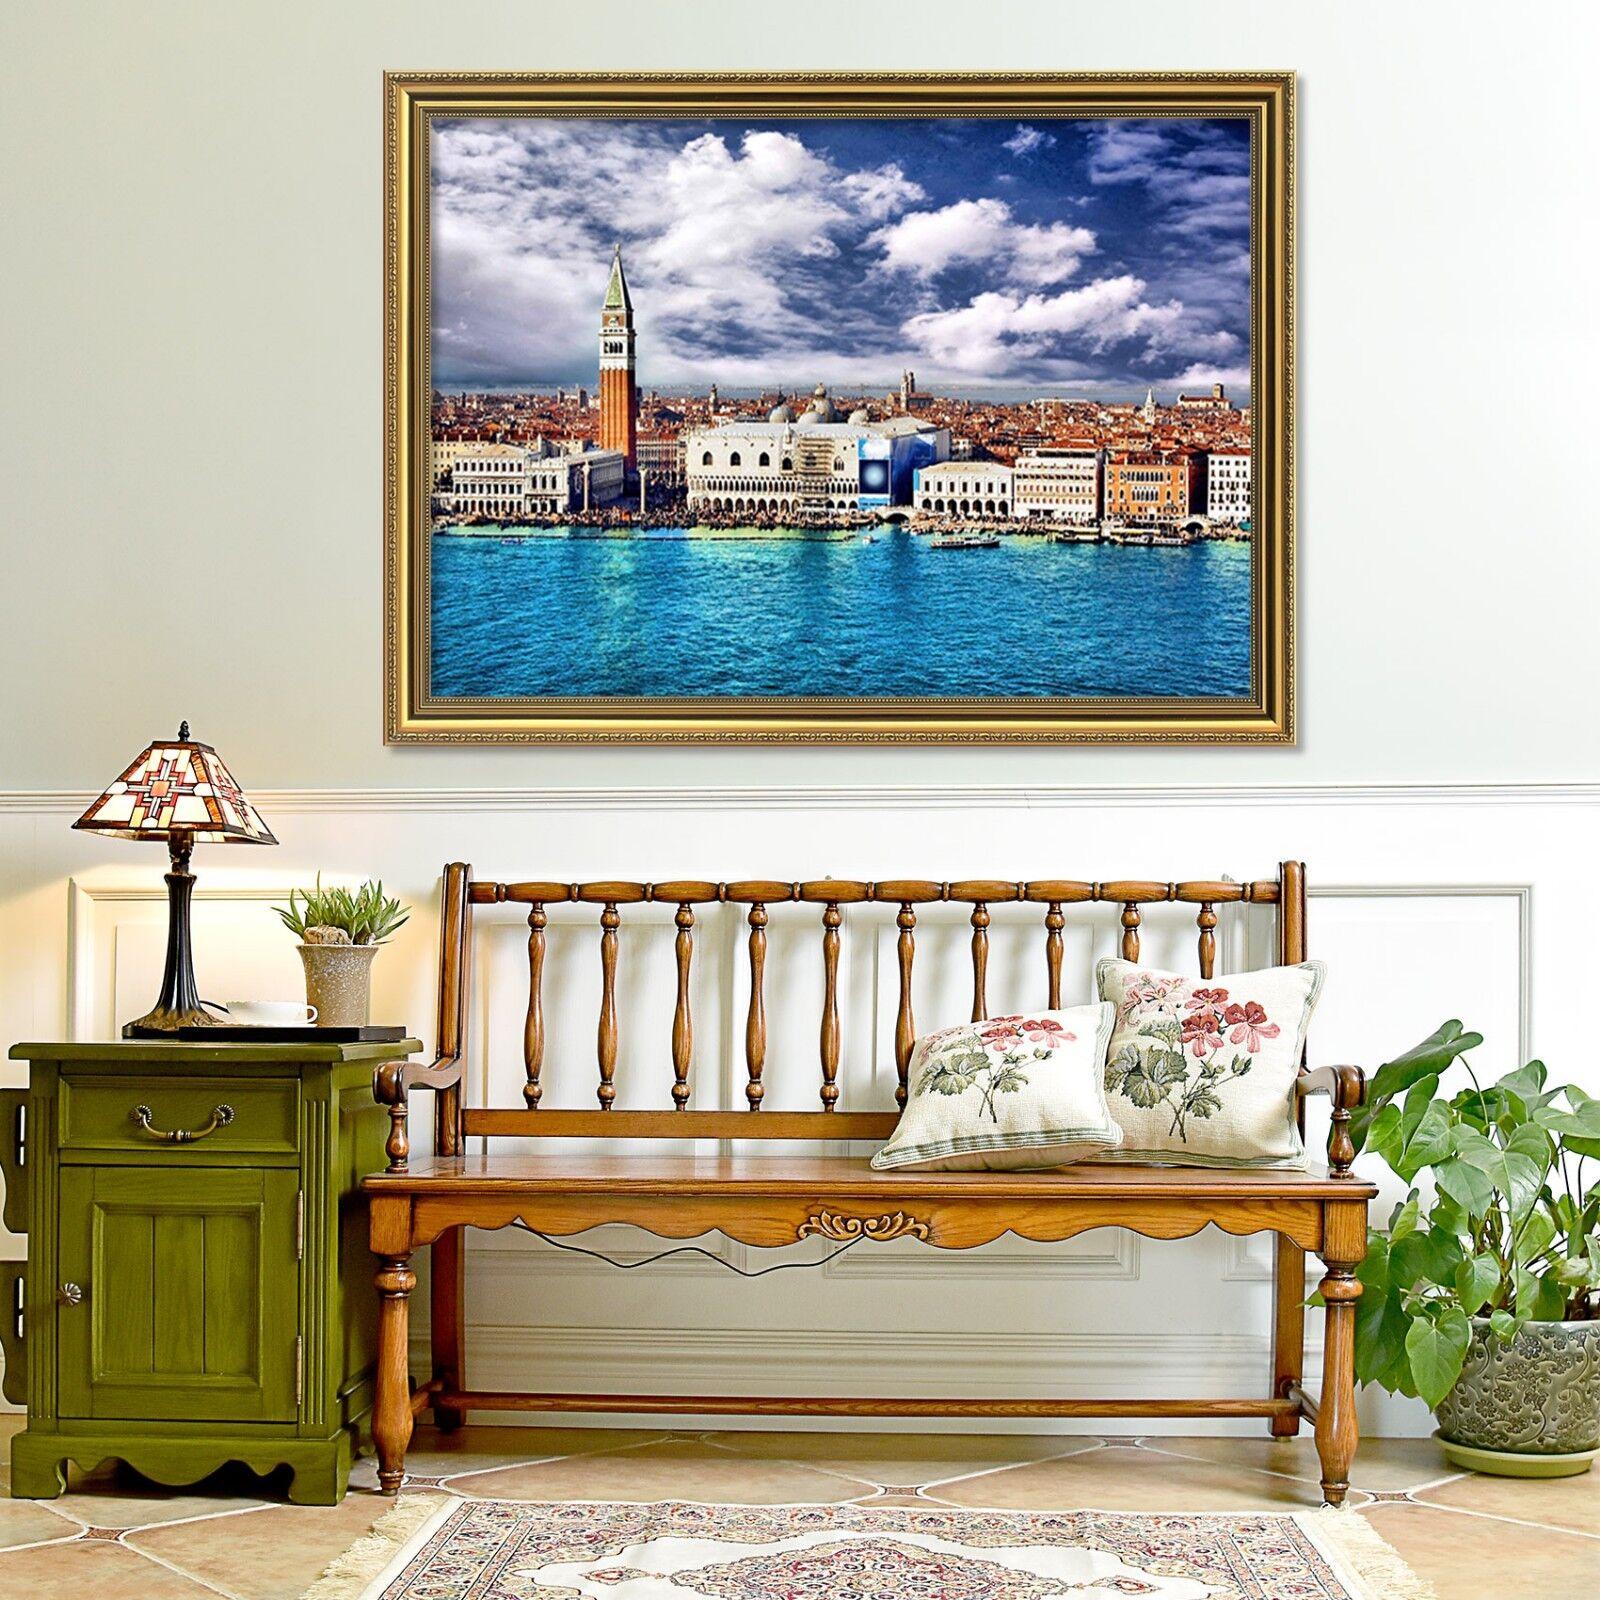 3D bluee City 4 Framed Poster Home Decor Print Painting Art AJ WALLPAPER AU